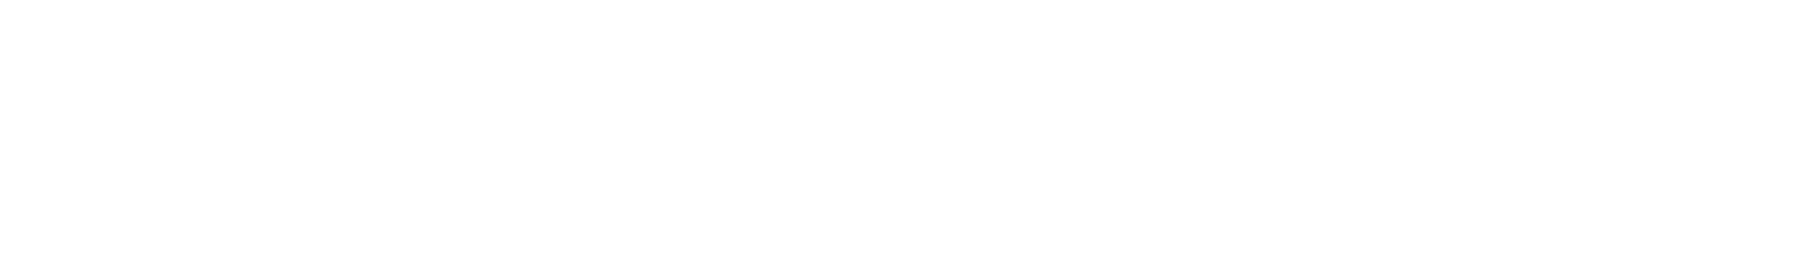 shg percussion 35